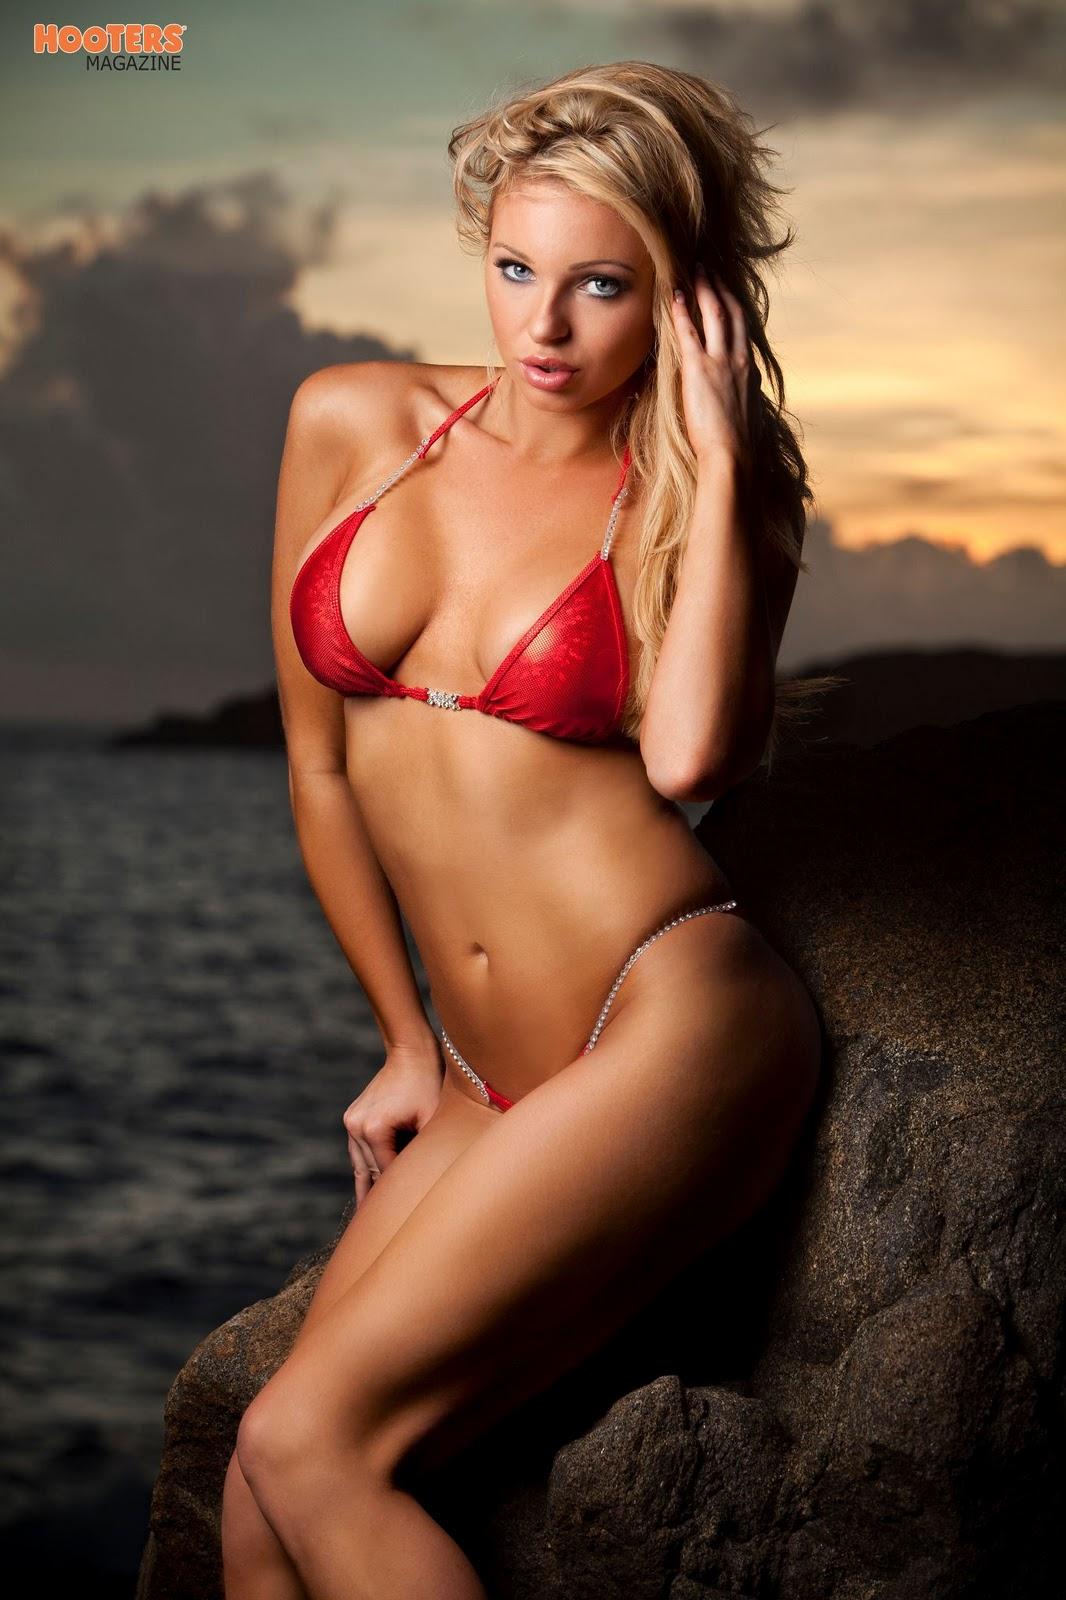 Hotters Girl Hotter Alexa-6530